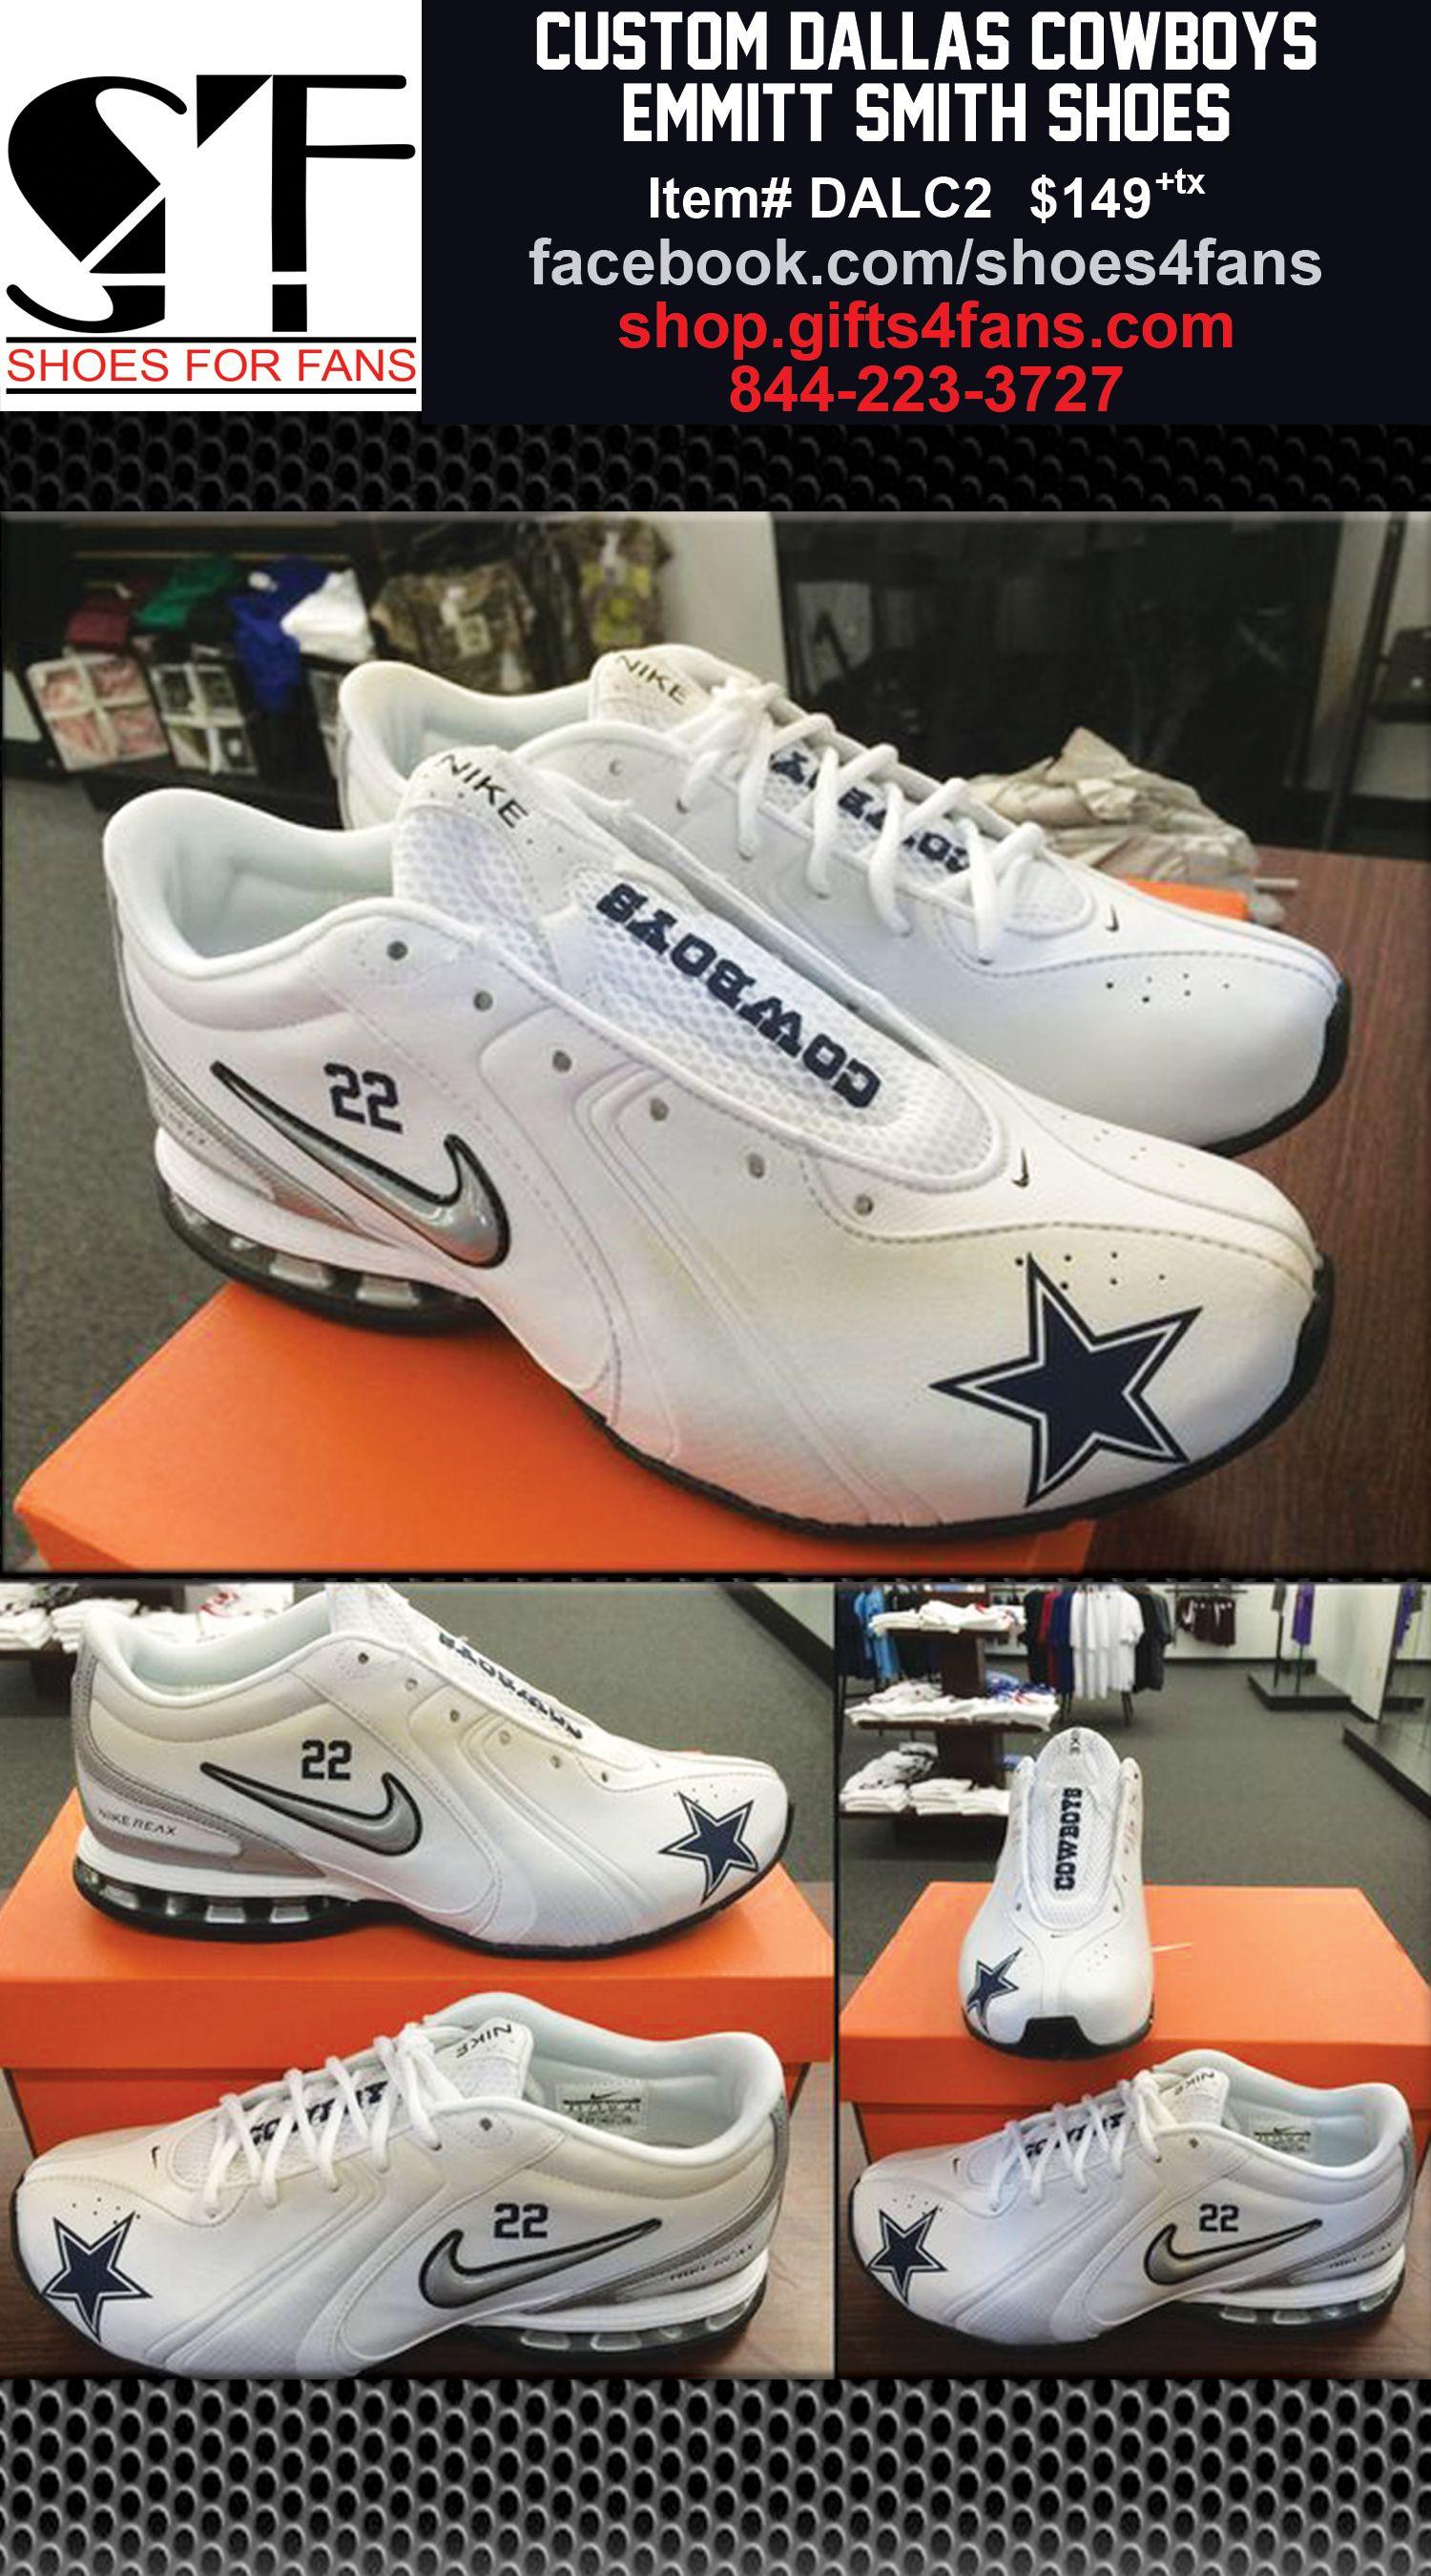 898612a7e6c602 ... Custom Dallas Cowboys Emmitt Smith Shoes. Order now!  shop.gifts4fans.com Nike Dallas Cowboys Sneakers ...